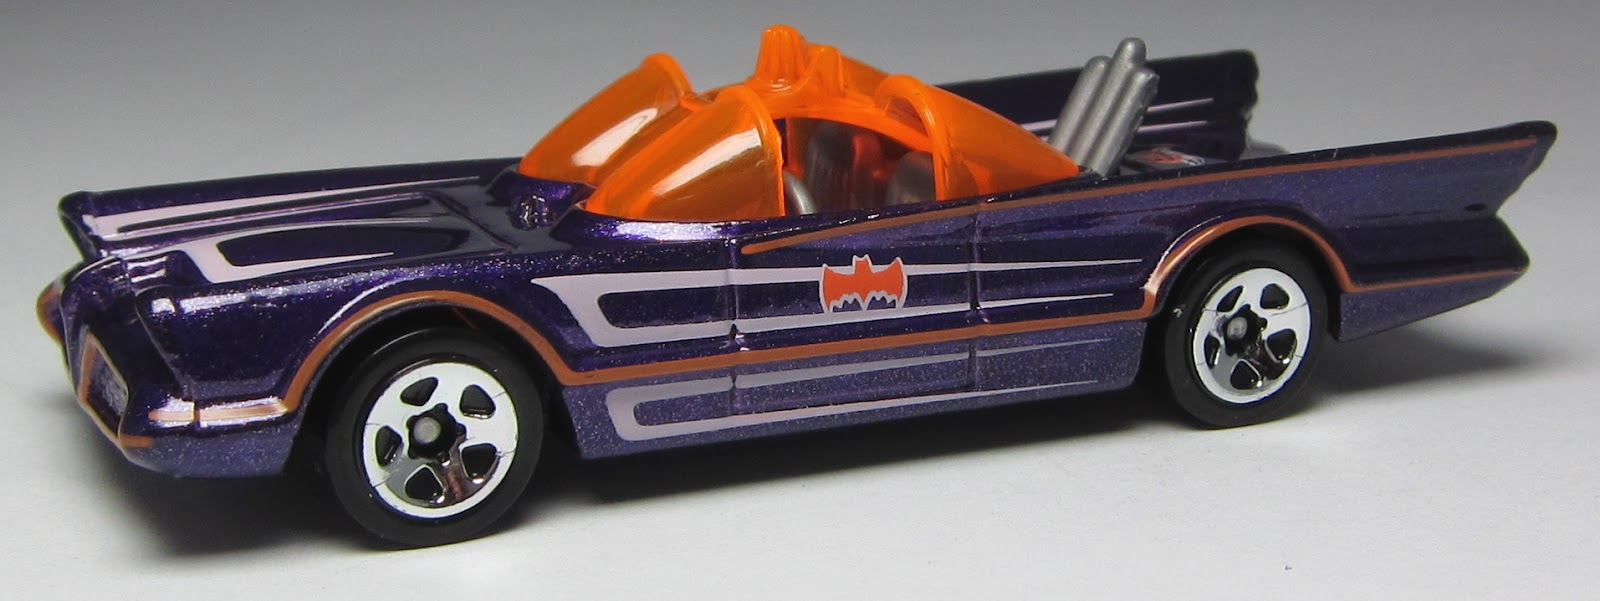 Car Lamley Group First Look Hot Wheels Halloween